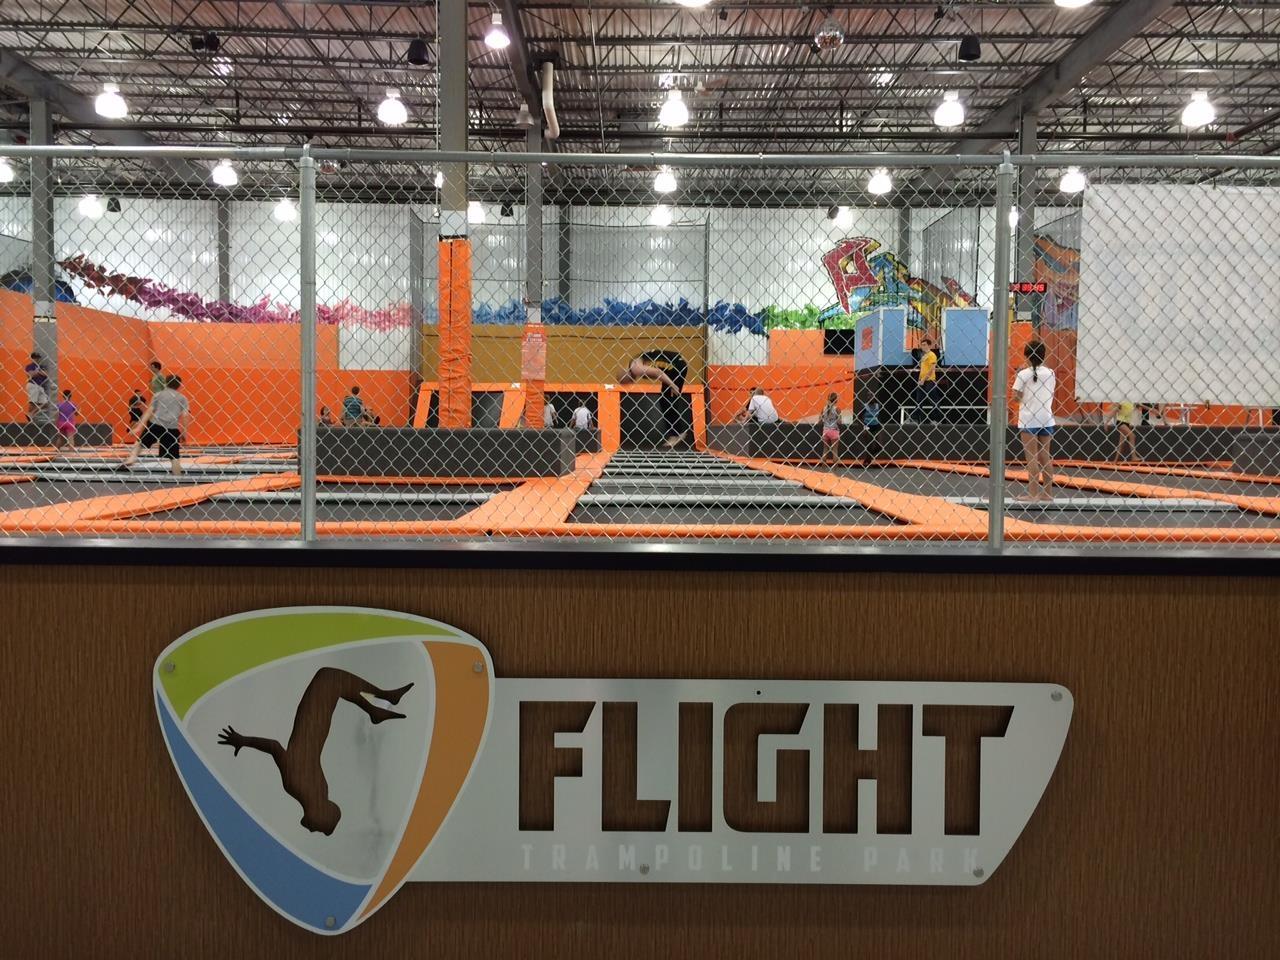 Flight trampoline coupons